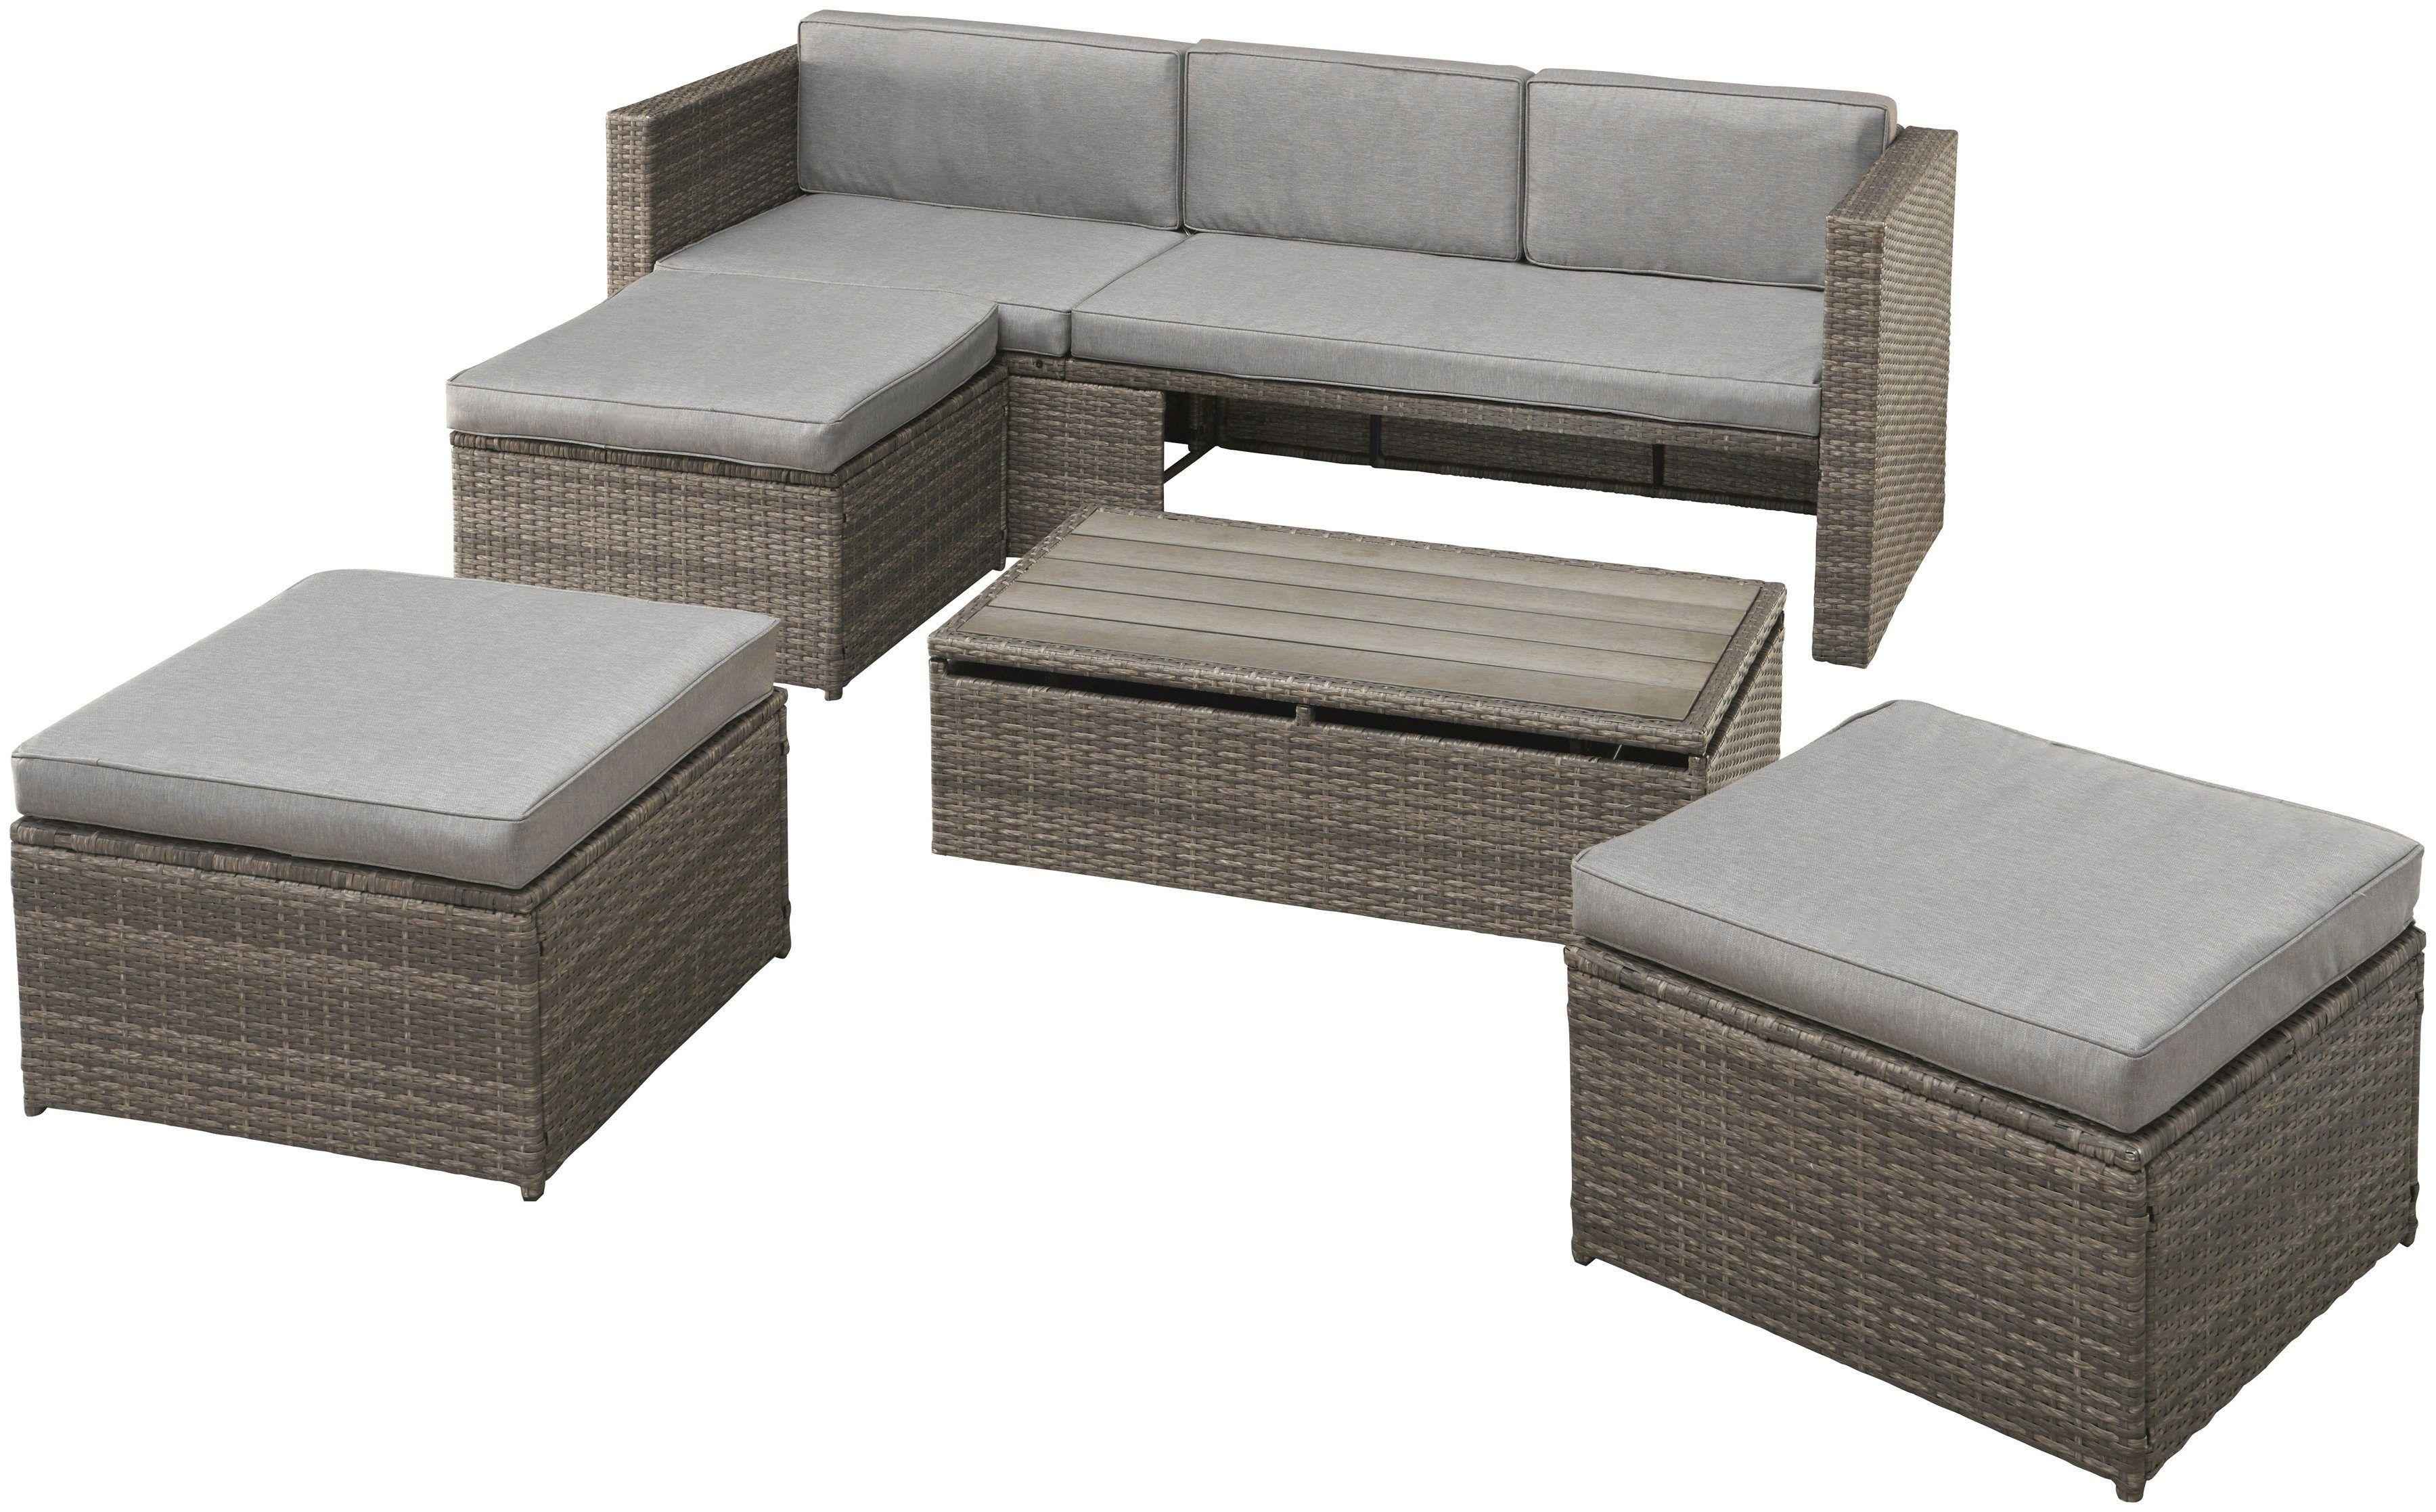 Konifera Loungeset Lagos Premium 13 Tlg 3er Sofa 3 Hocker Tisch Polyrattan Polyrattan Gartenmobel 3er Sofa